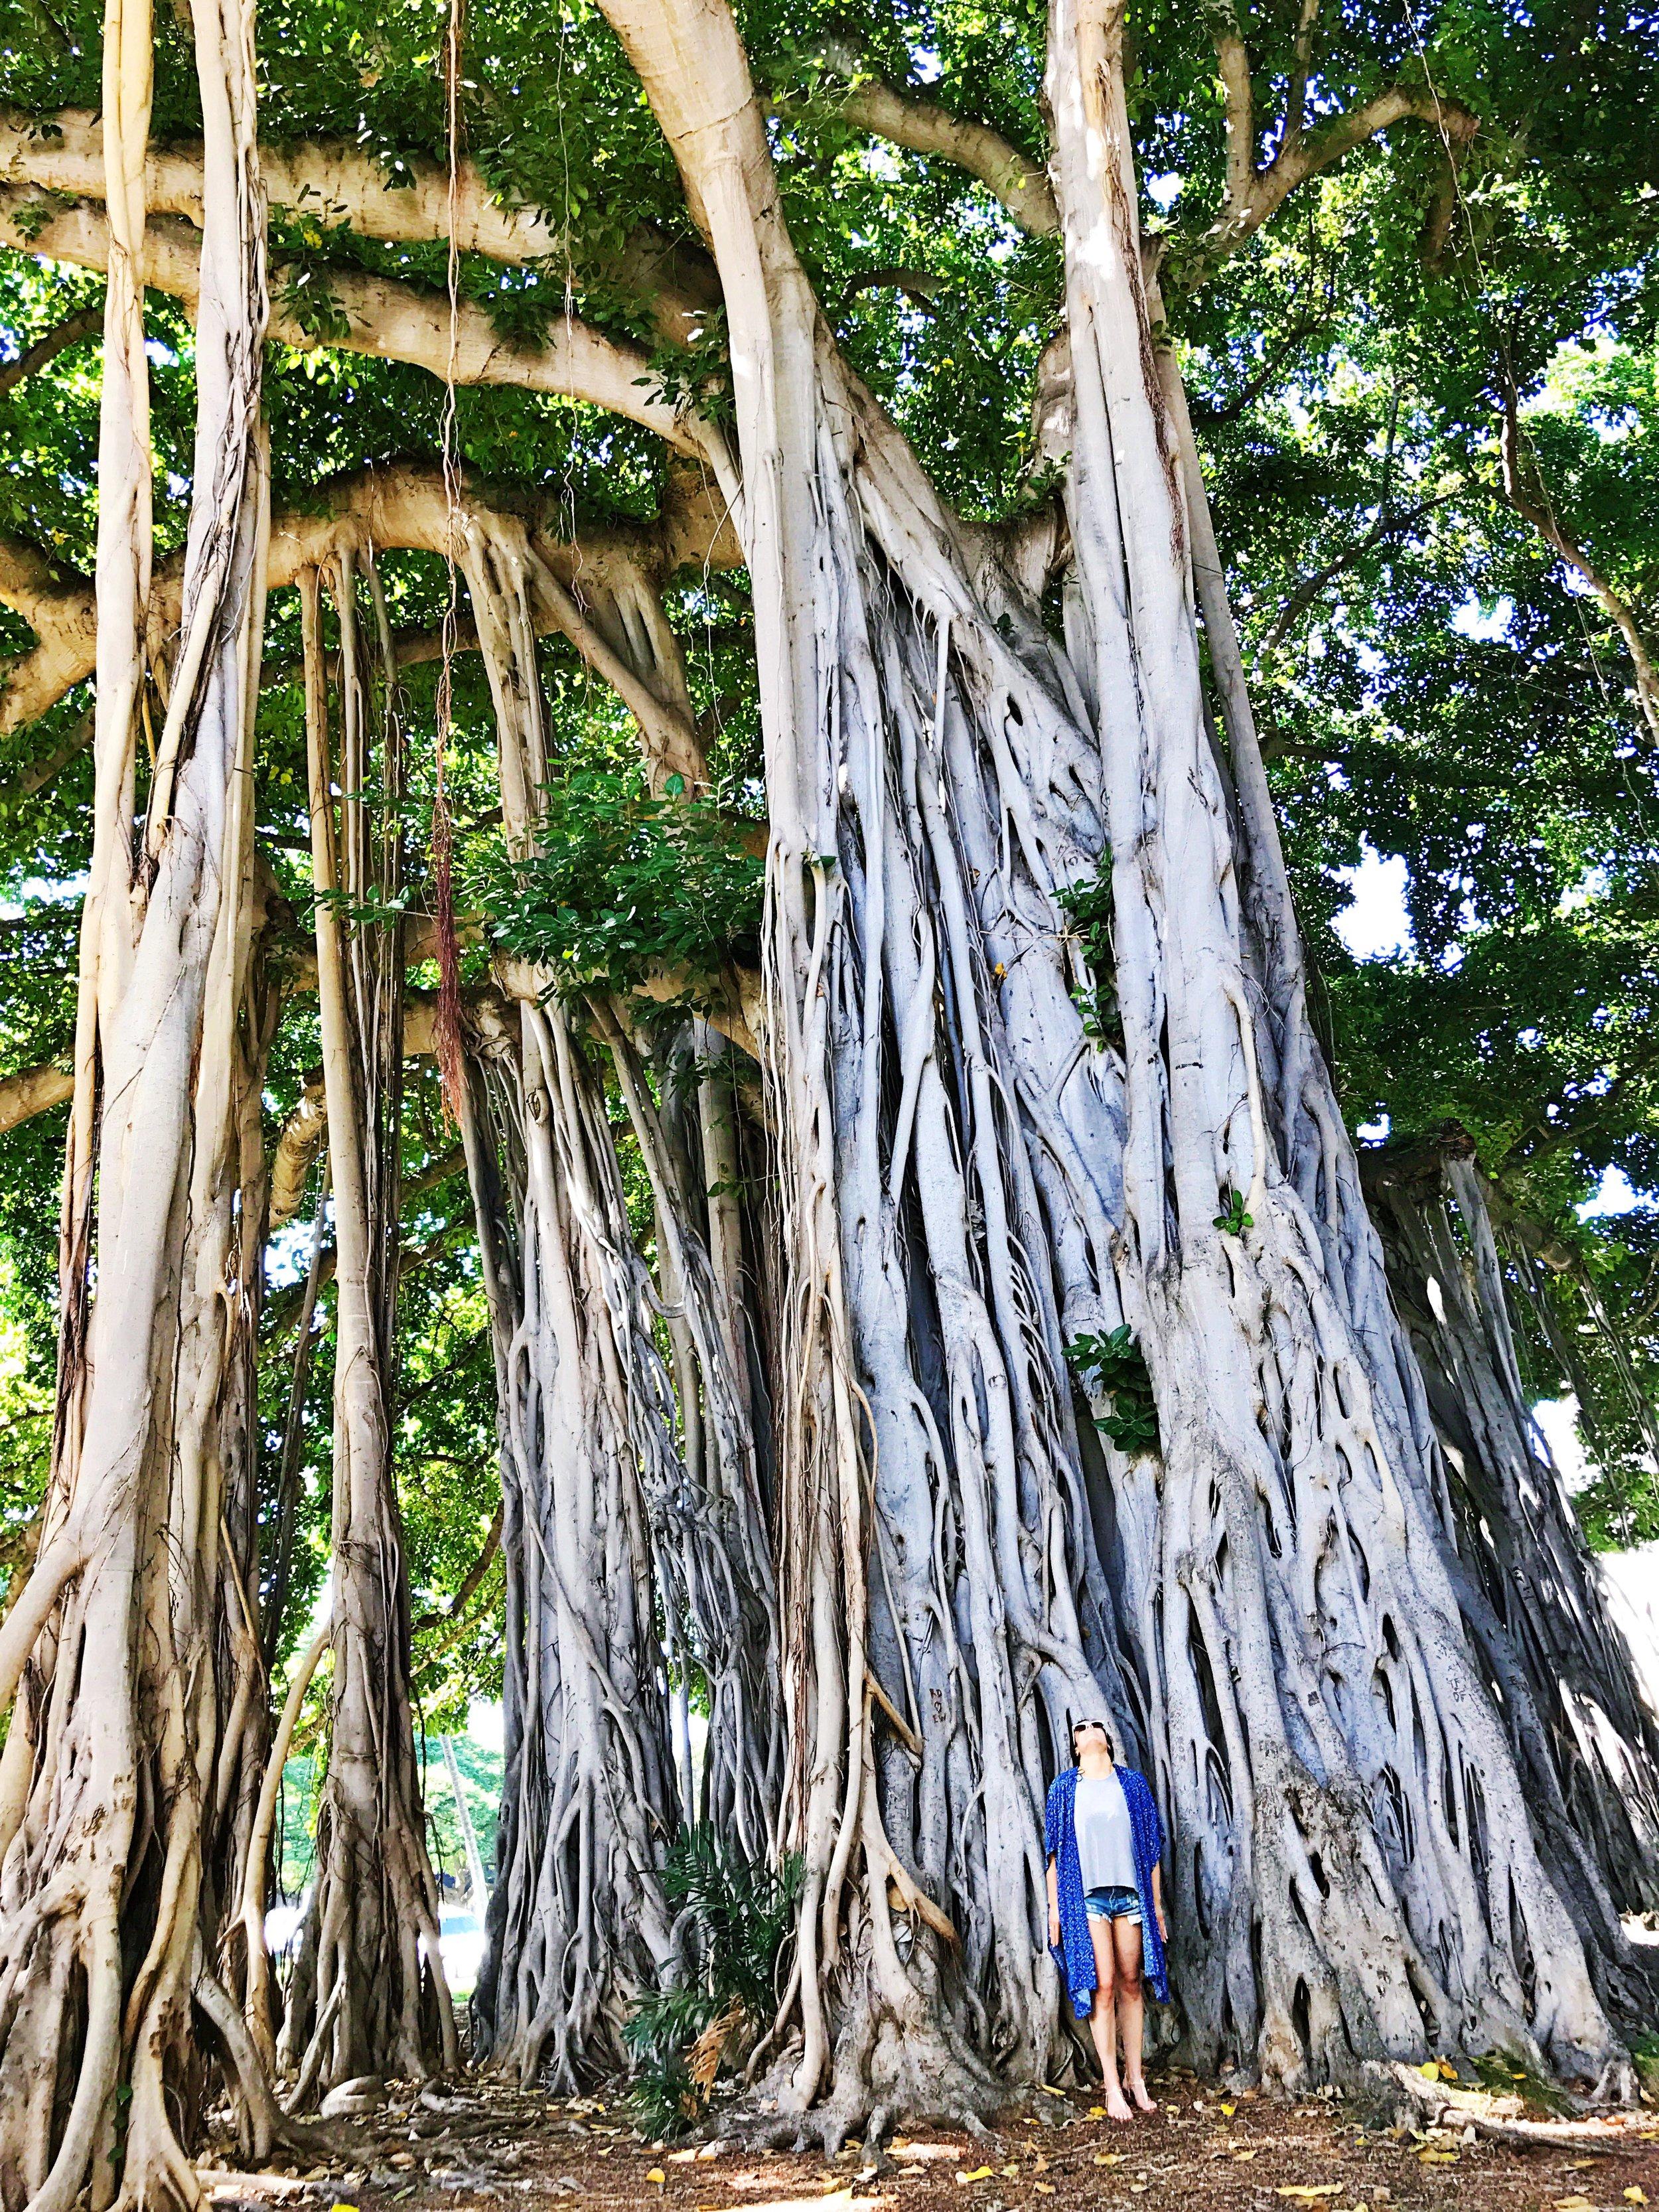 Honolulu Banyan Trees Oahu Hawaii Things to Do